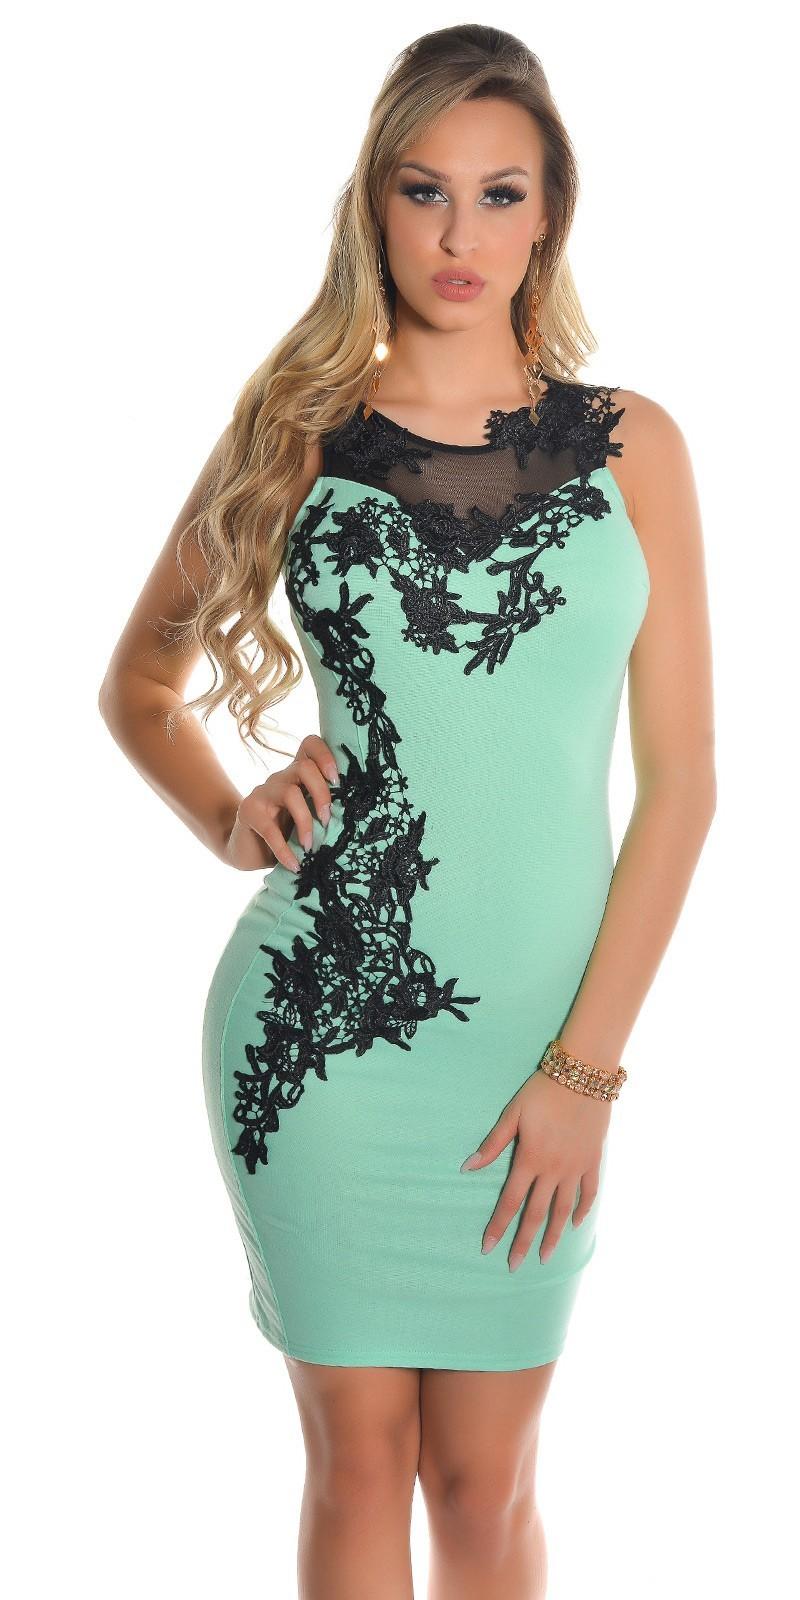 Spoločen. šaty krátke – Stránka 3 – Sissy Boutique f57f1dec1a6